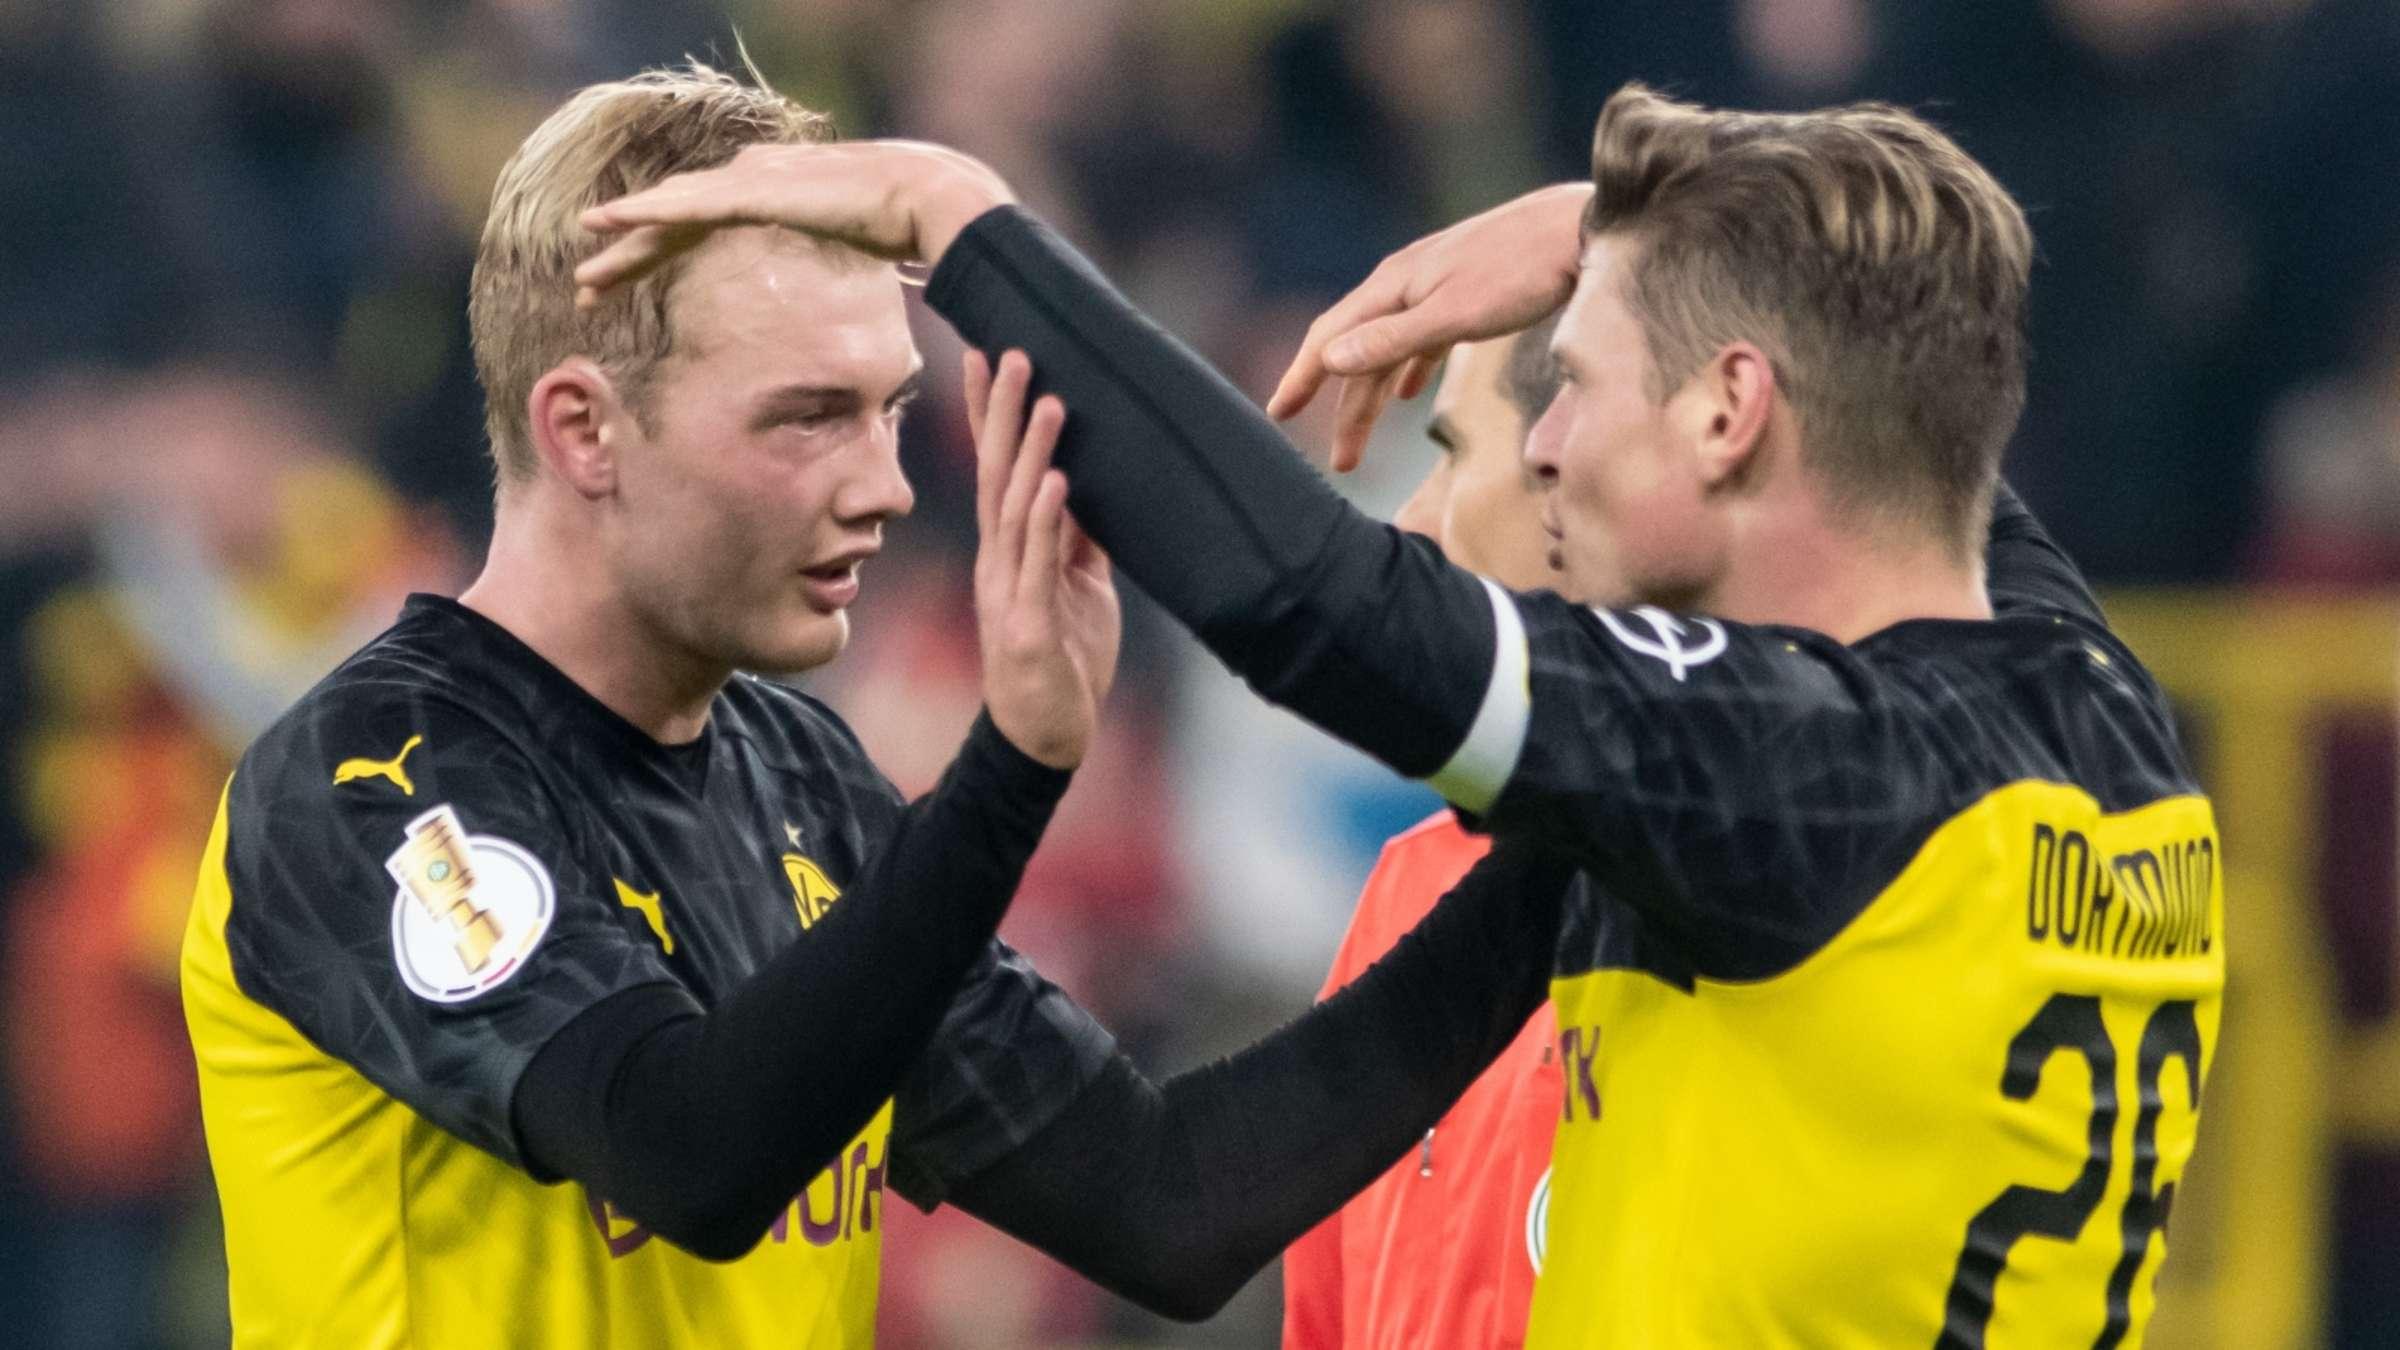 Bvb Gegen Borussia Monchengladbach Dfb Pokal Live Im Free